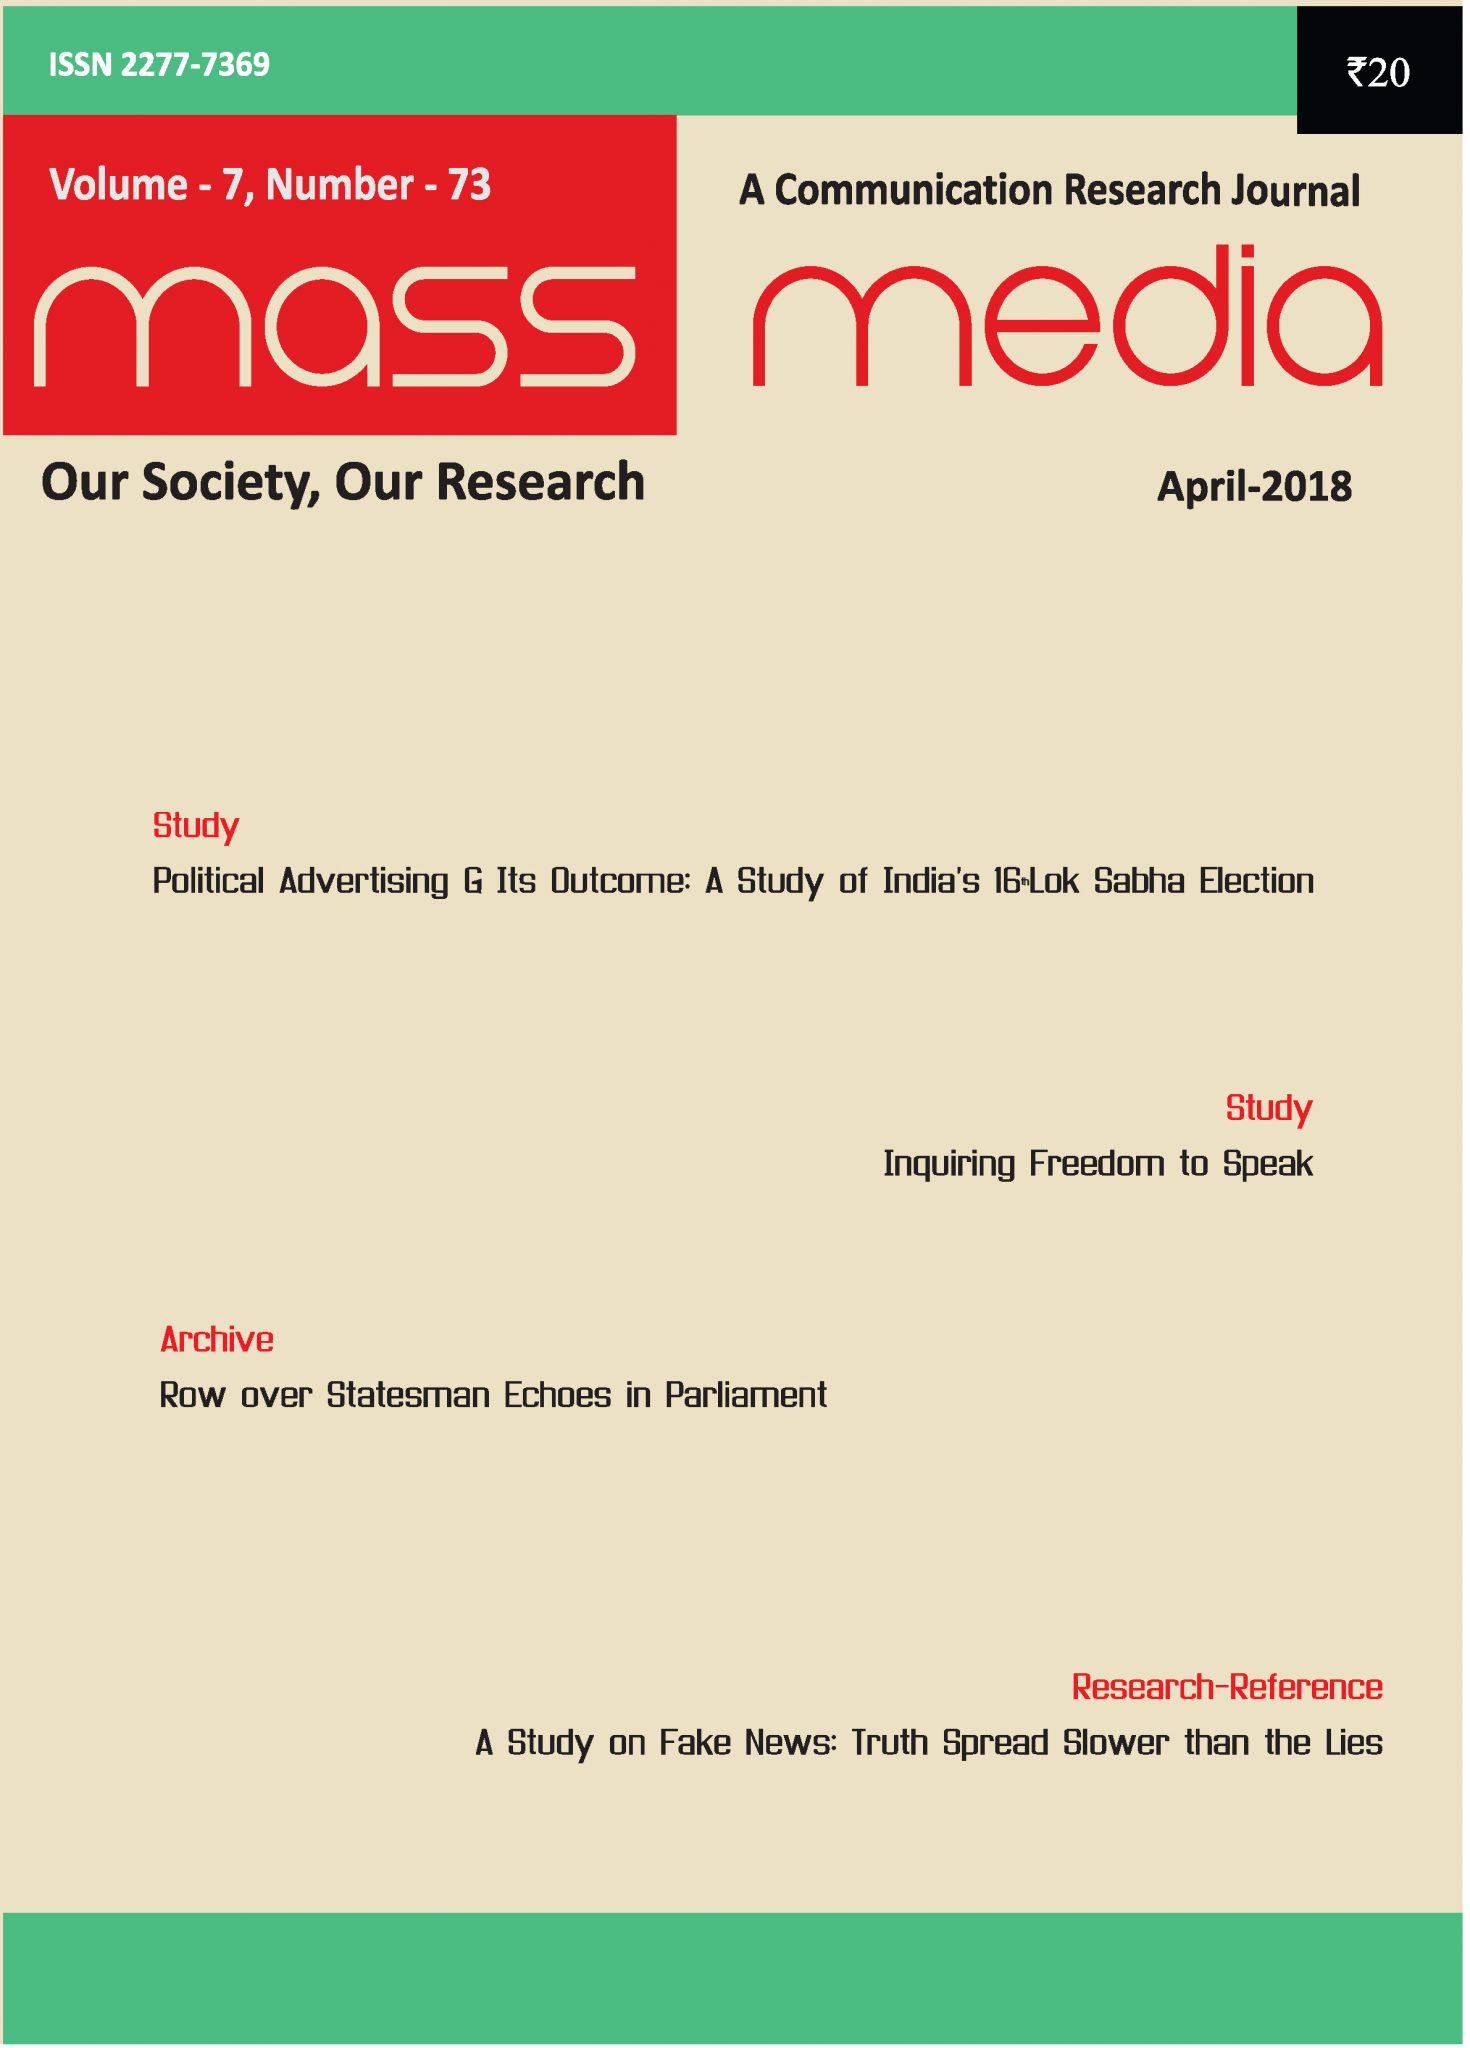 Mass Media (April 2018)